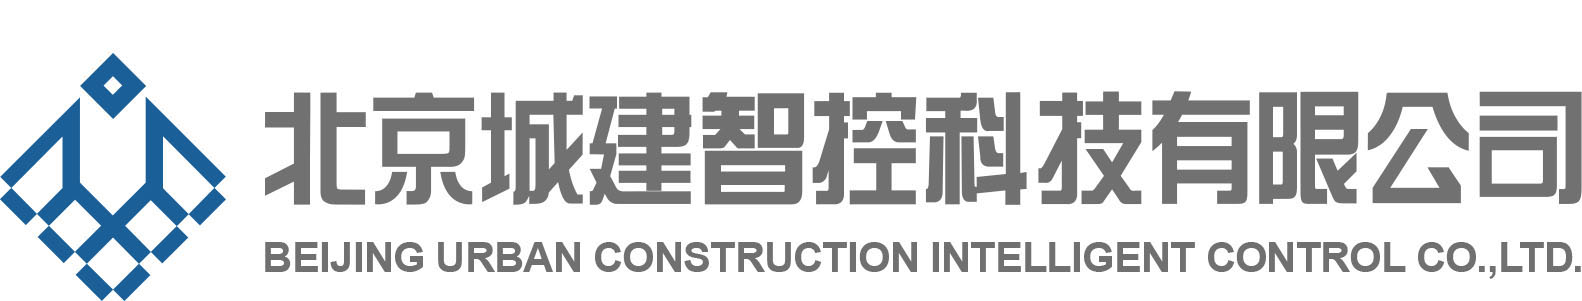 http://bjuci.com.cn/Public/uploads/2020-05-21/15900455011309034369.jpg